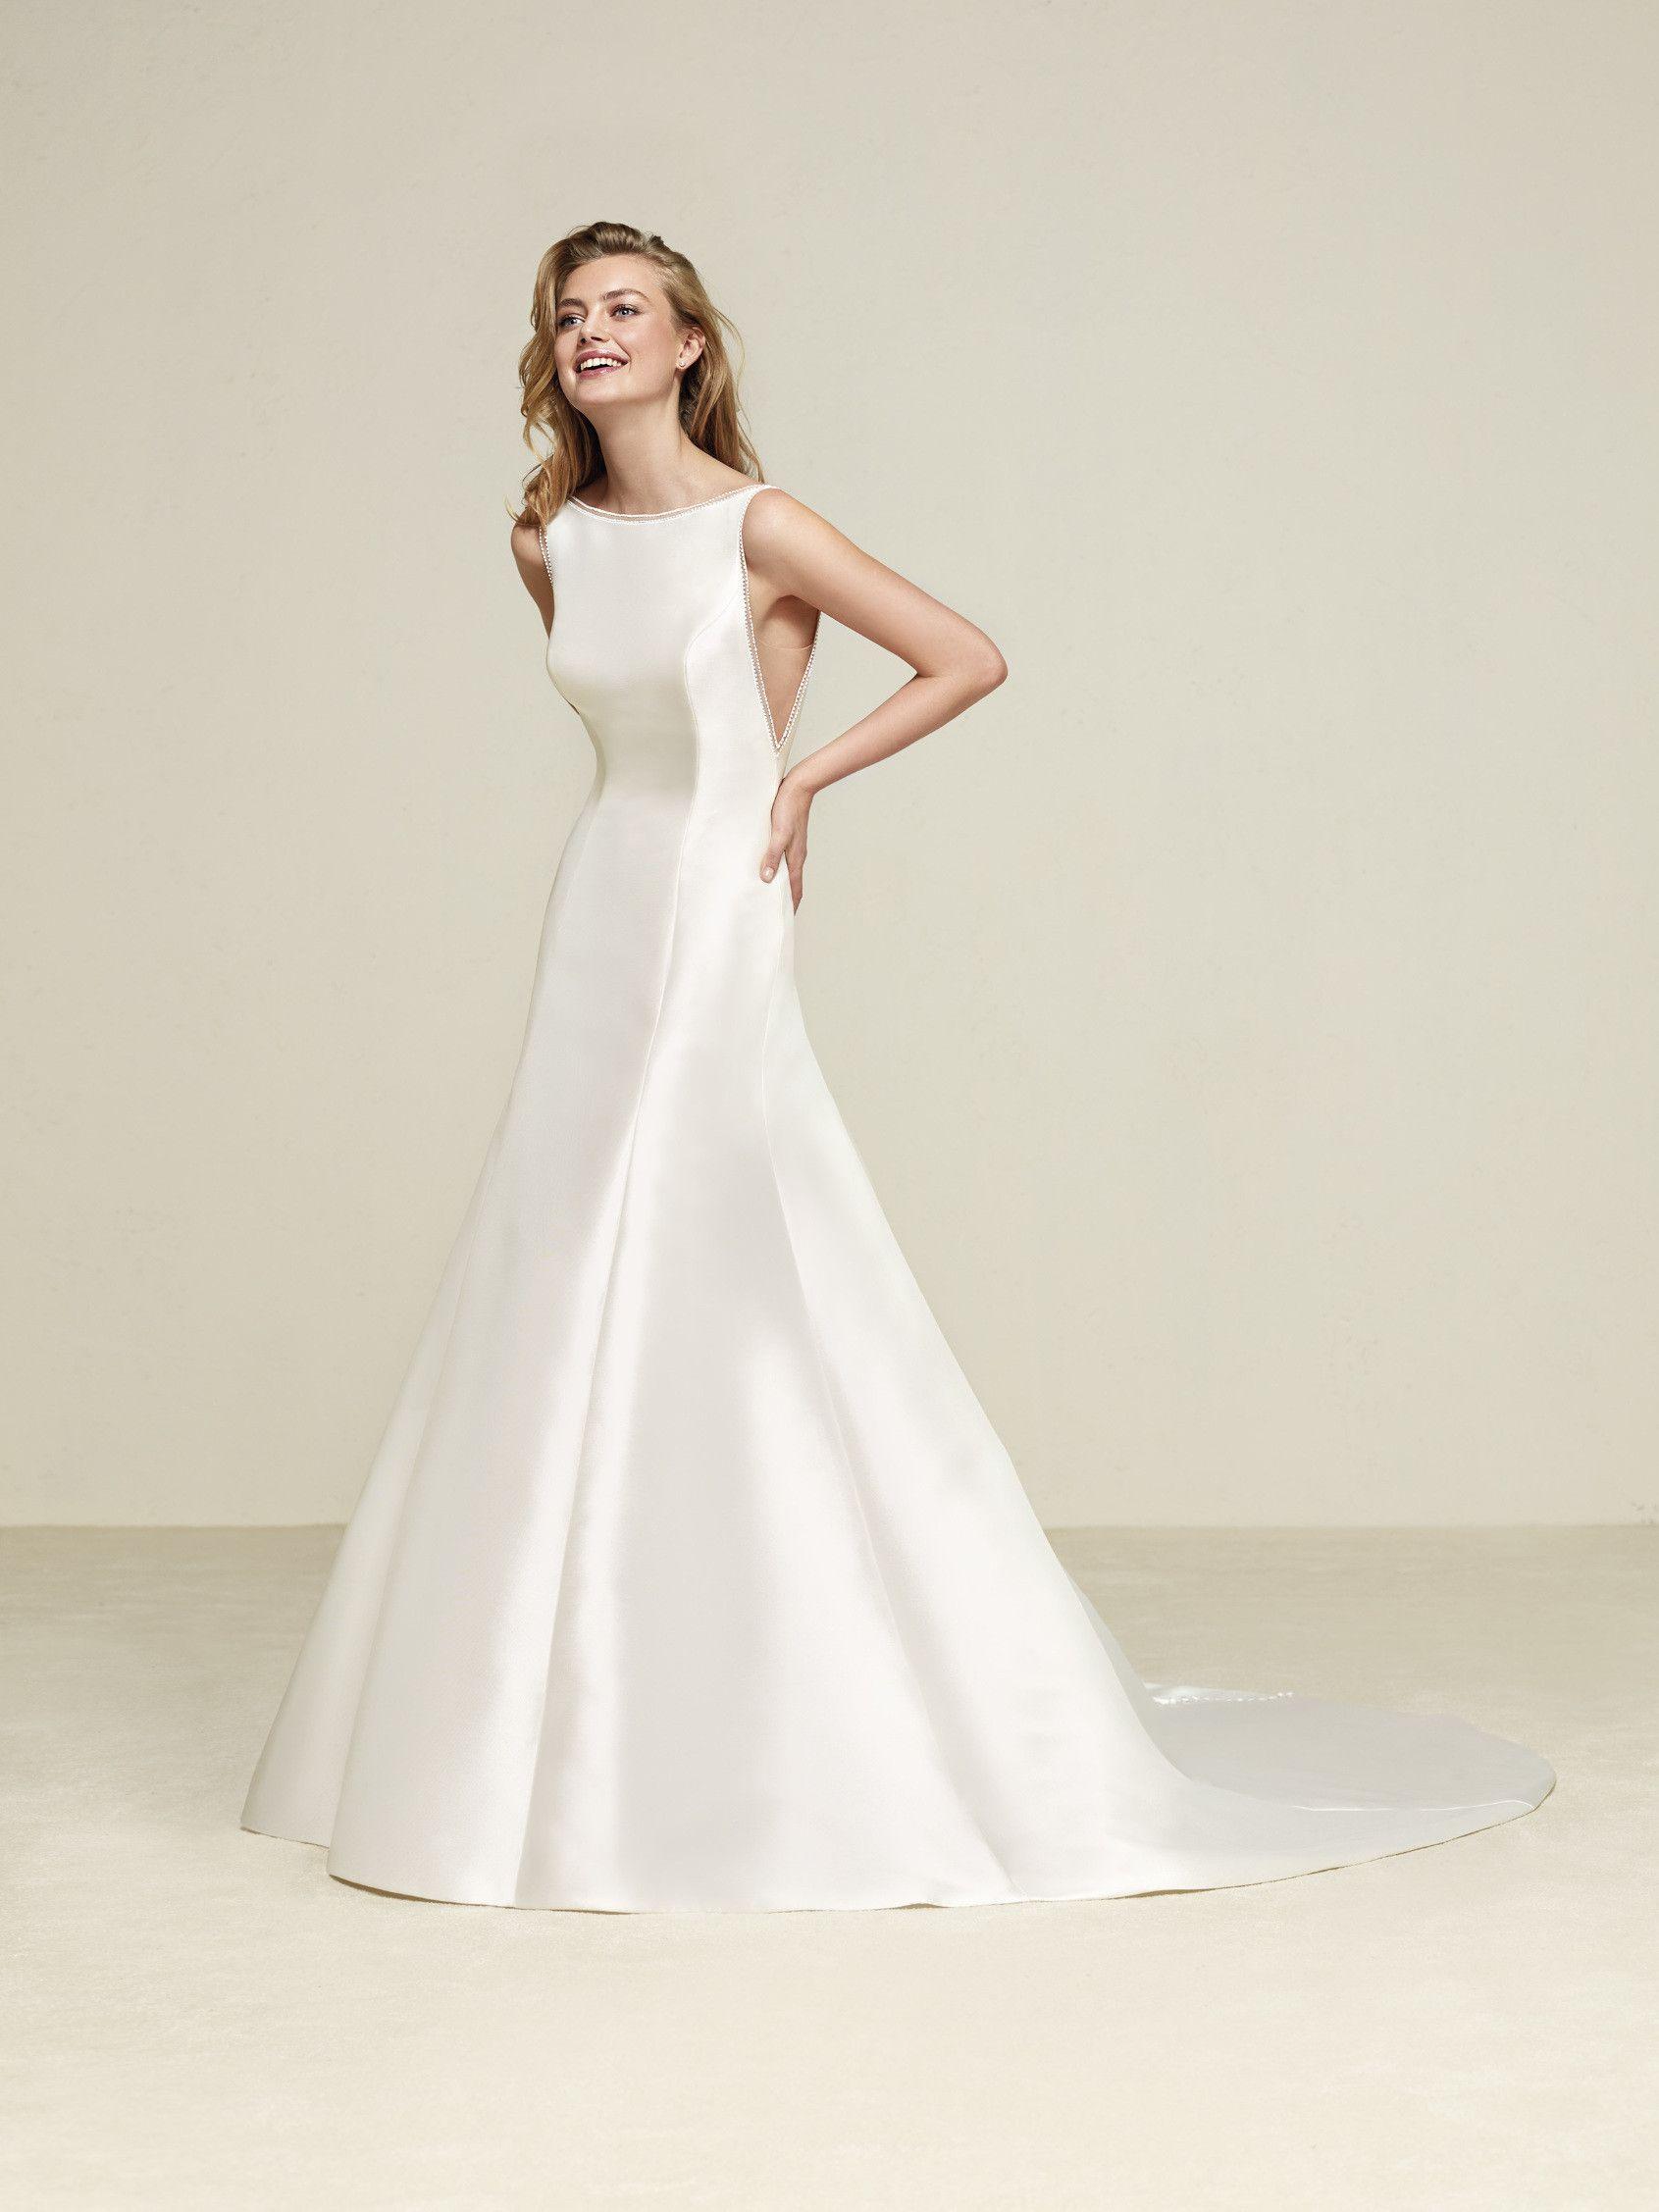 Elegant fitted wedding dresses  Wedding dress  Druna  Drömblask  Pinterest  Wedding dress